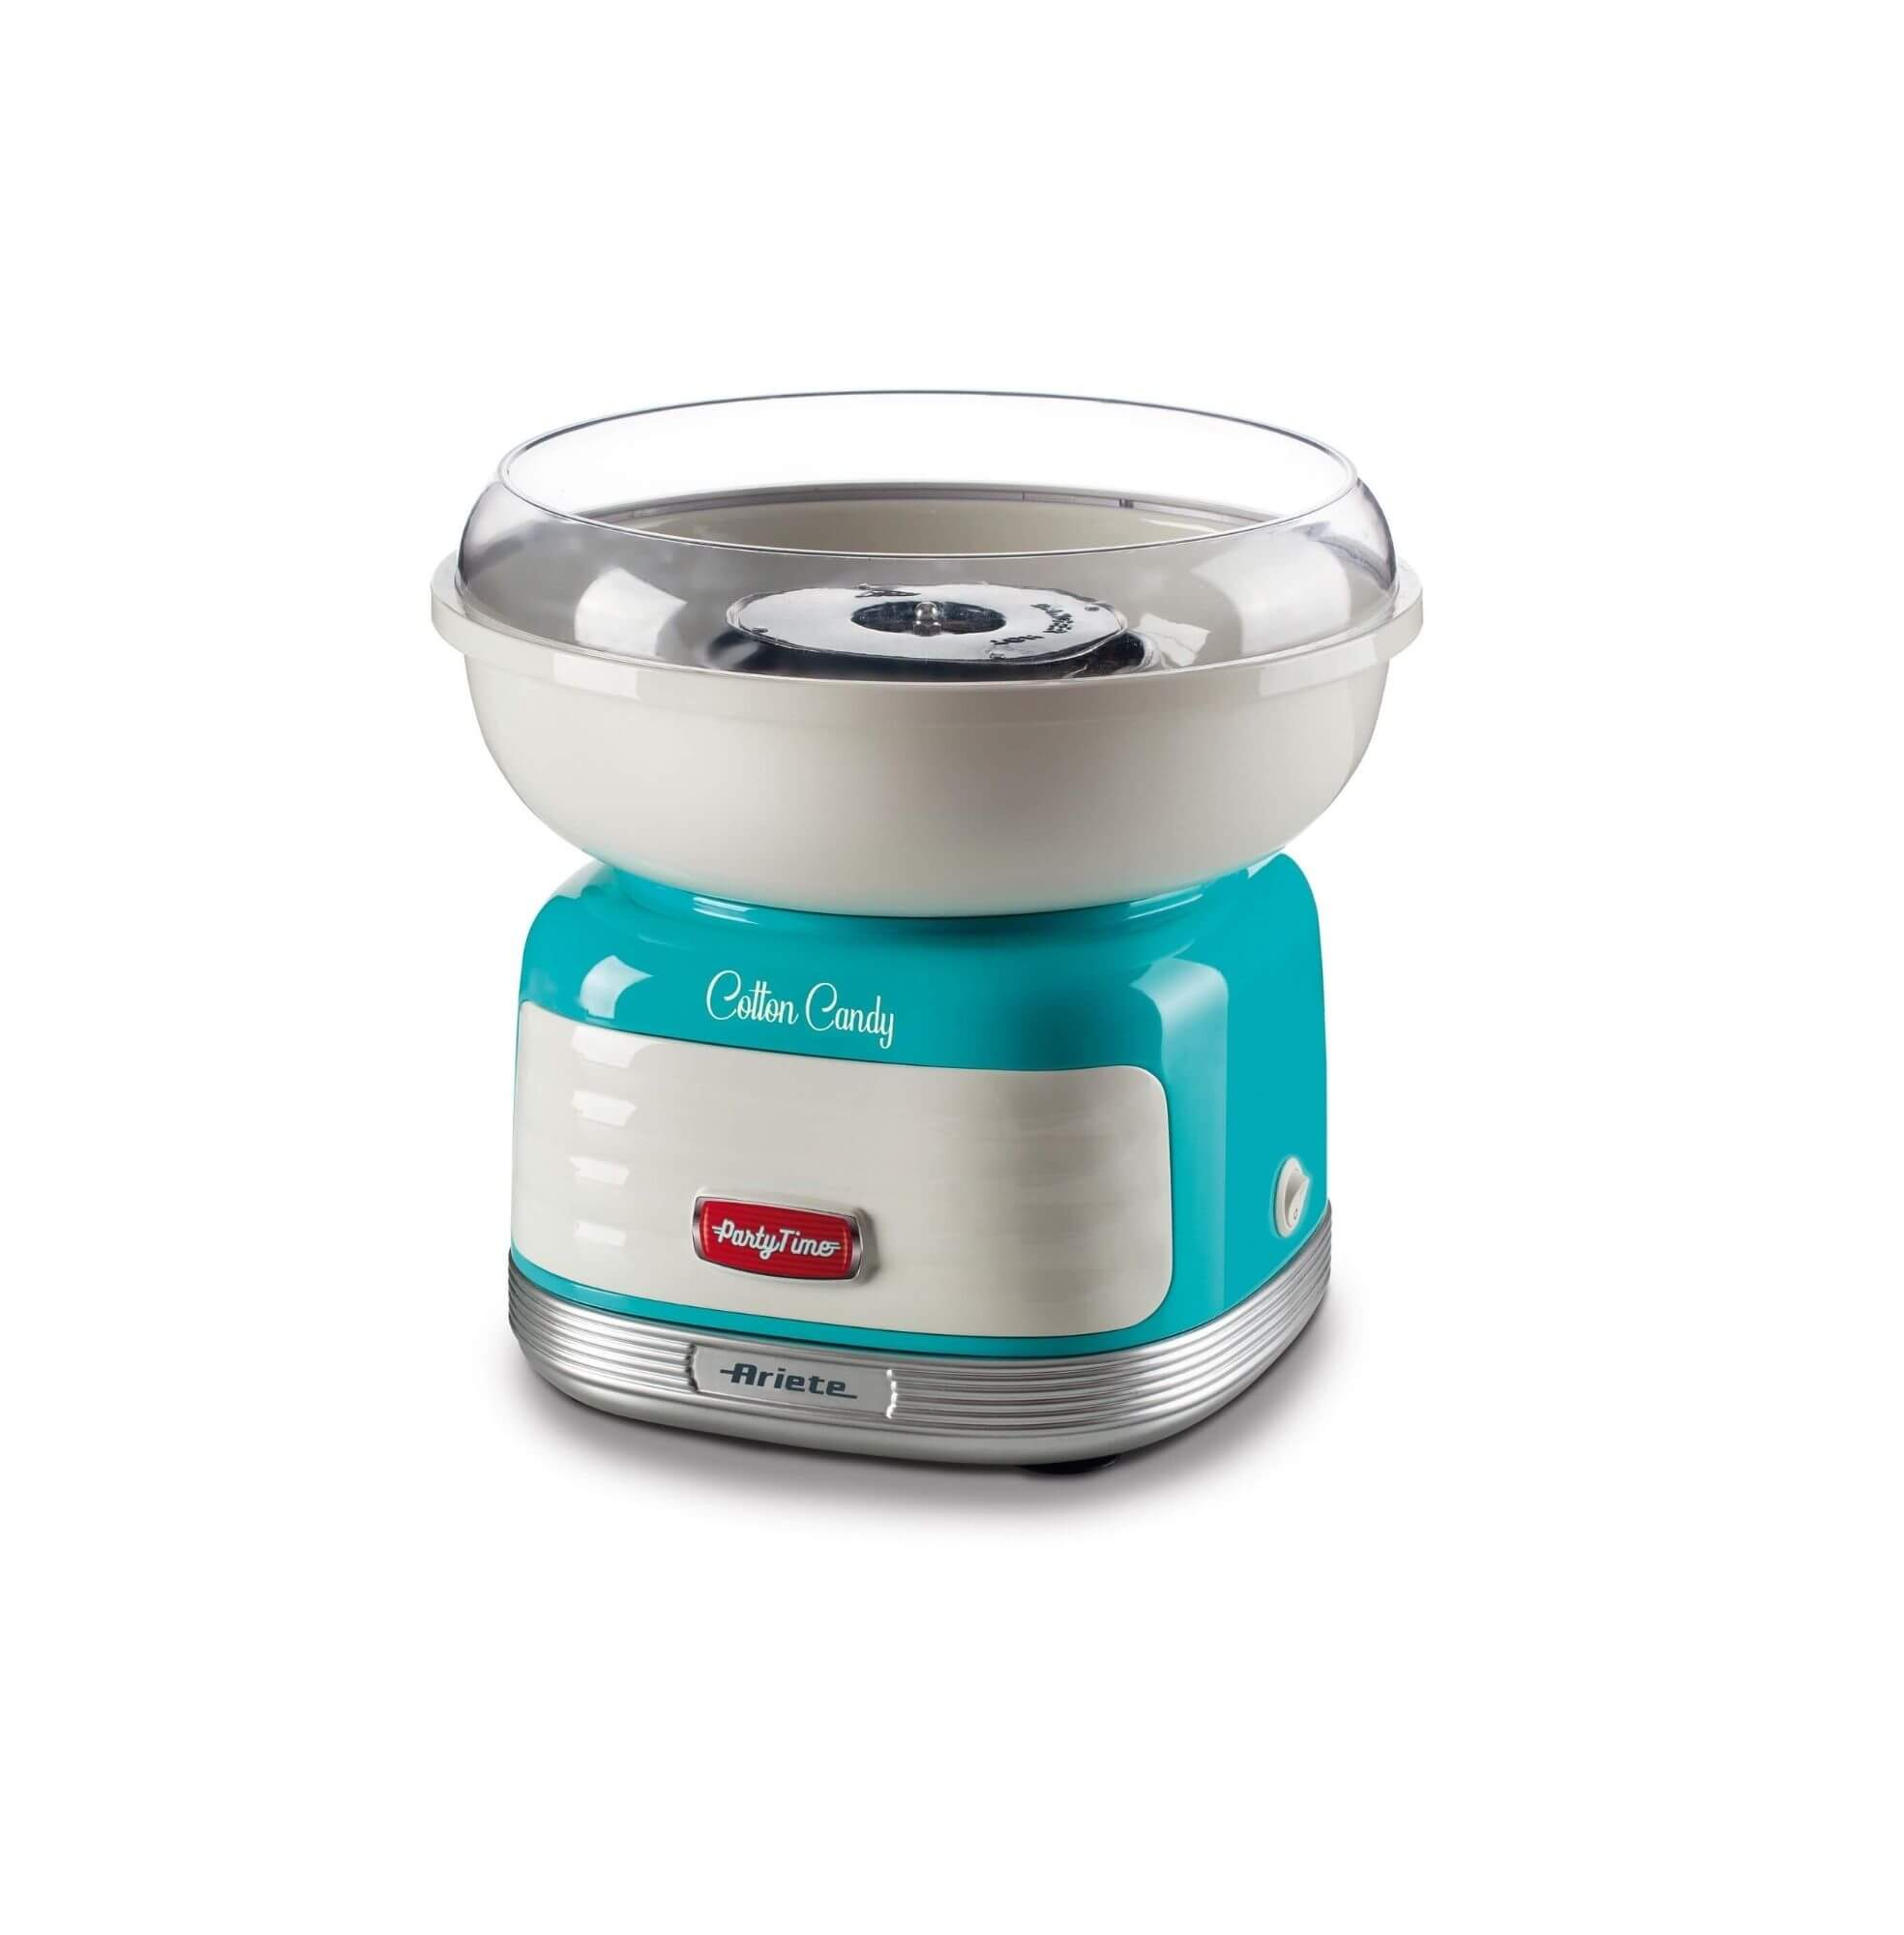 Ariete 2973 macchina per zucchero filato Blu, Argento, Bianco 450 W